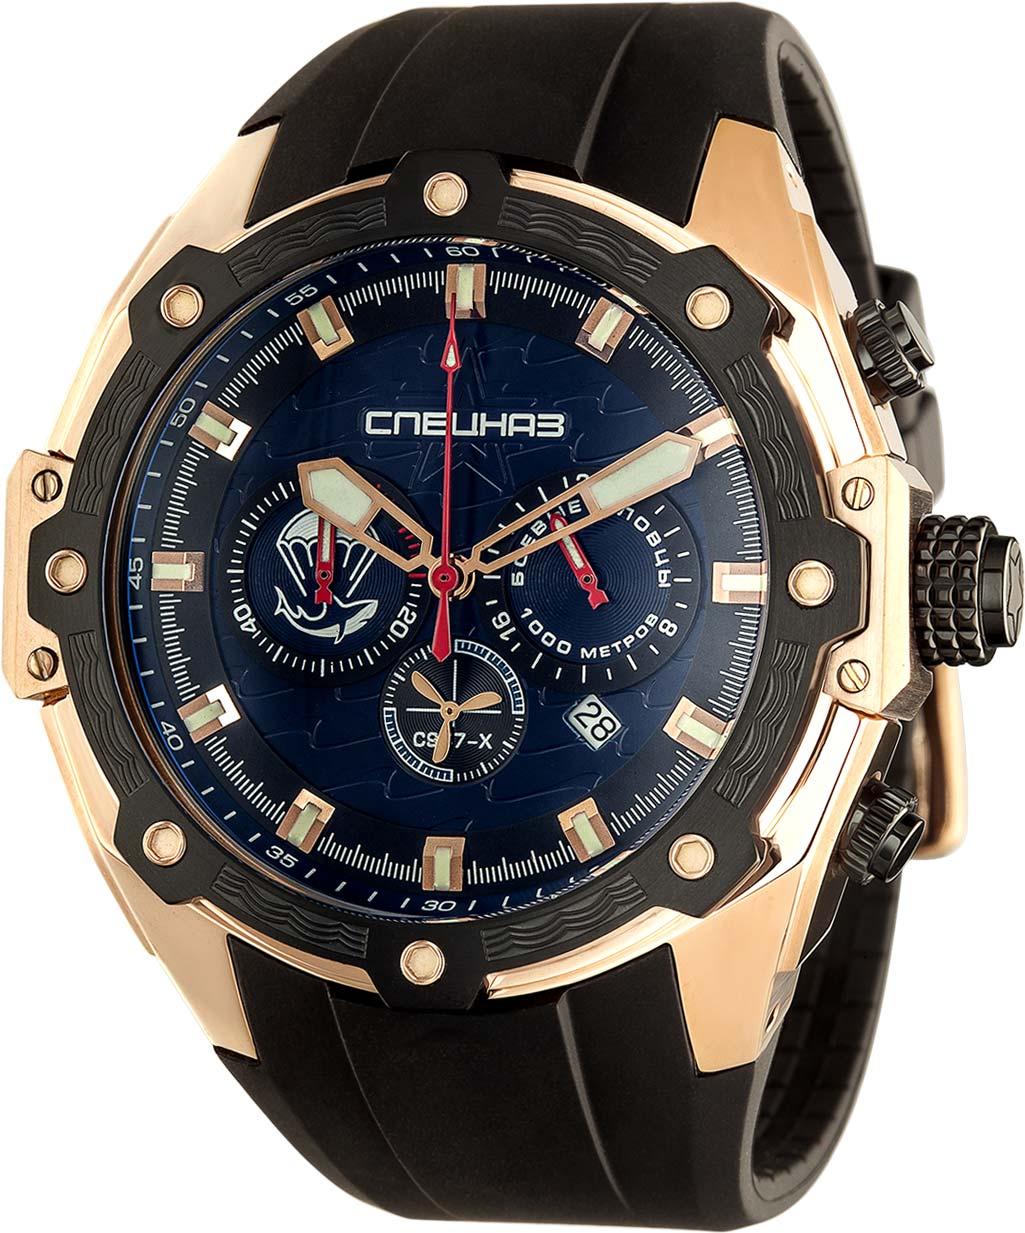 Фото - Мужские часы Спецназ C9473435-OS20 мужские часы спецназ c9370288 os20